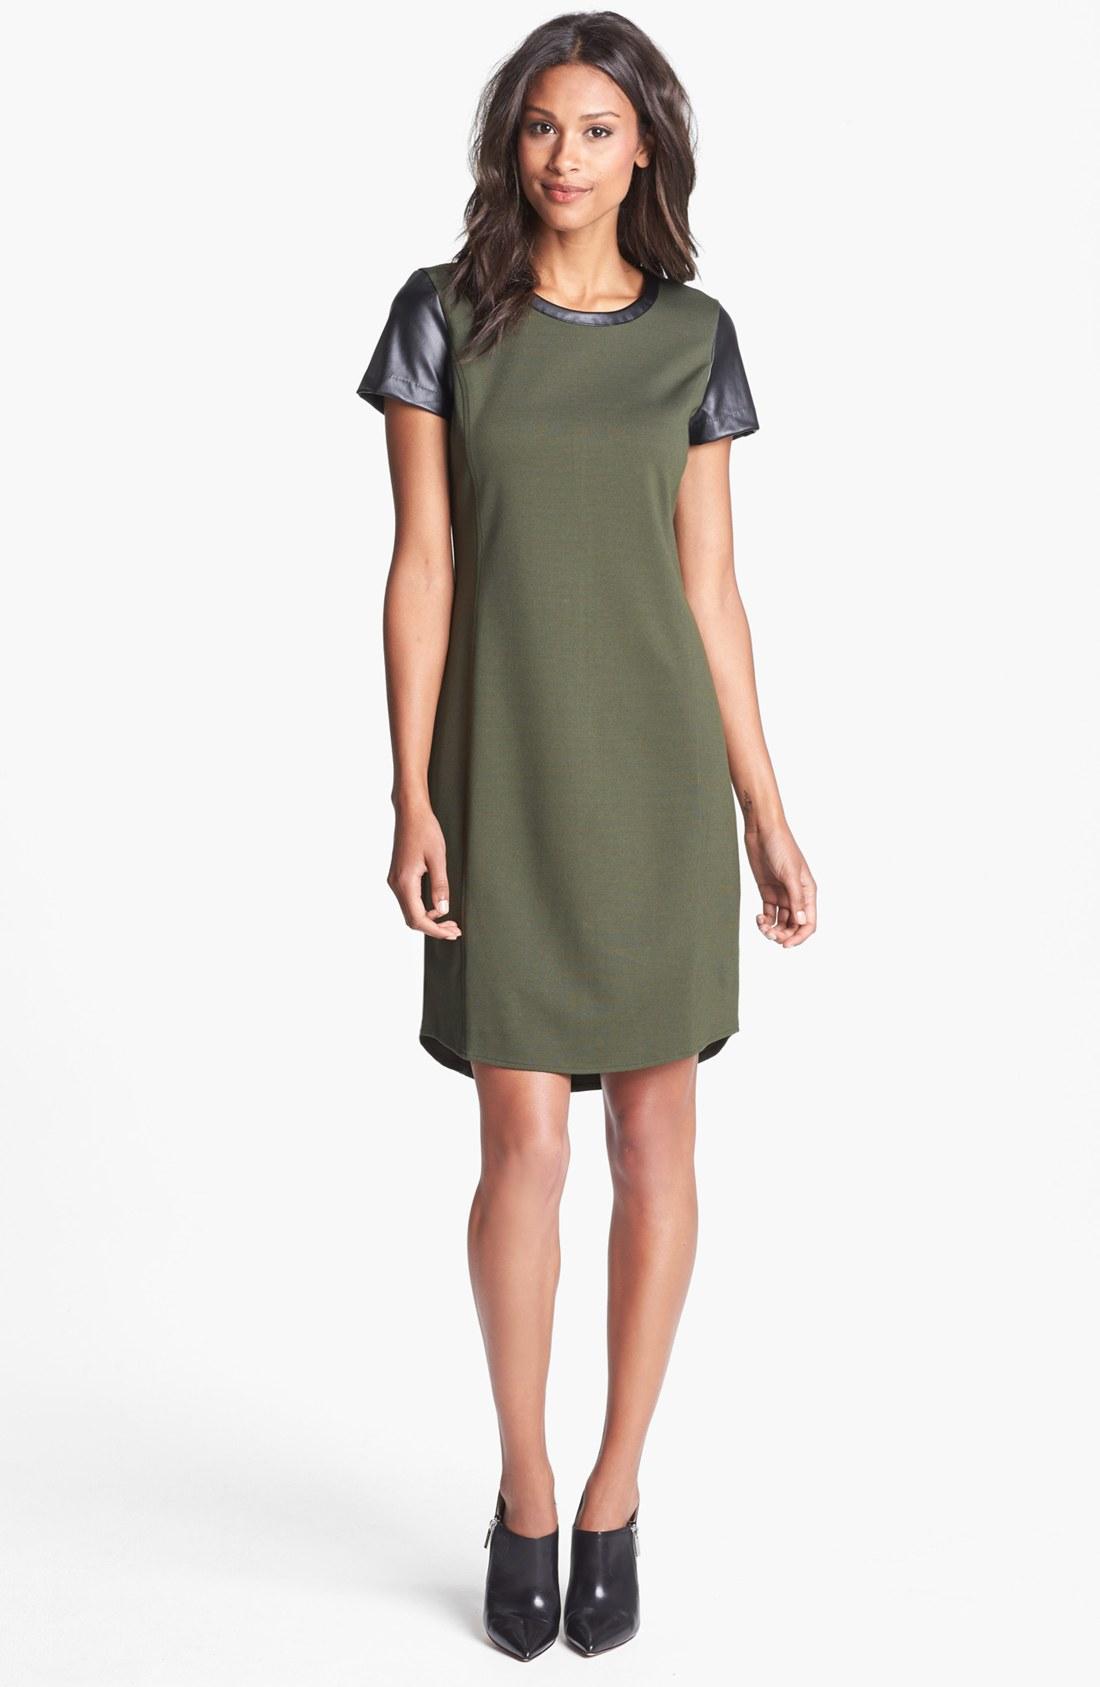 Dkny Faux Leather Sleeve Shift Dress in Green (Tourmaline ...